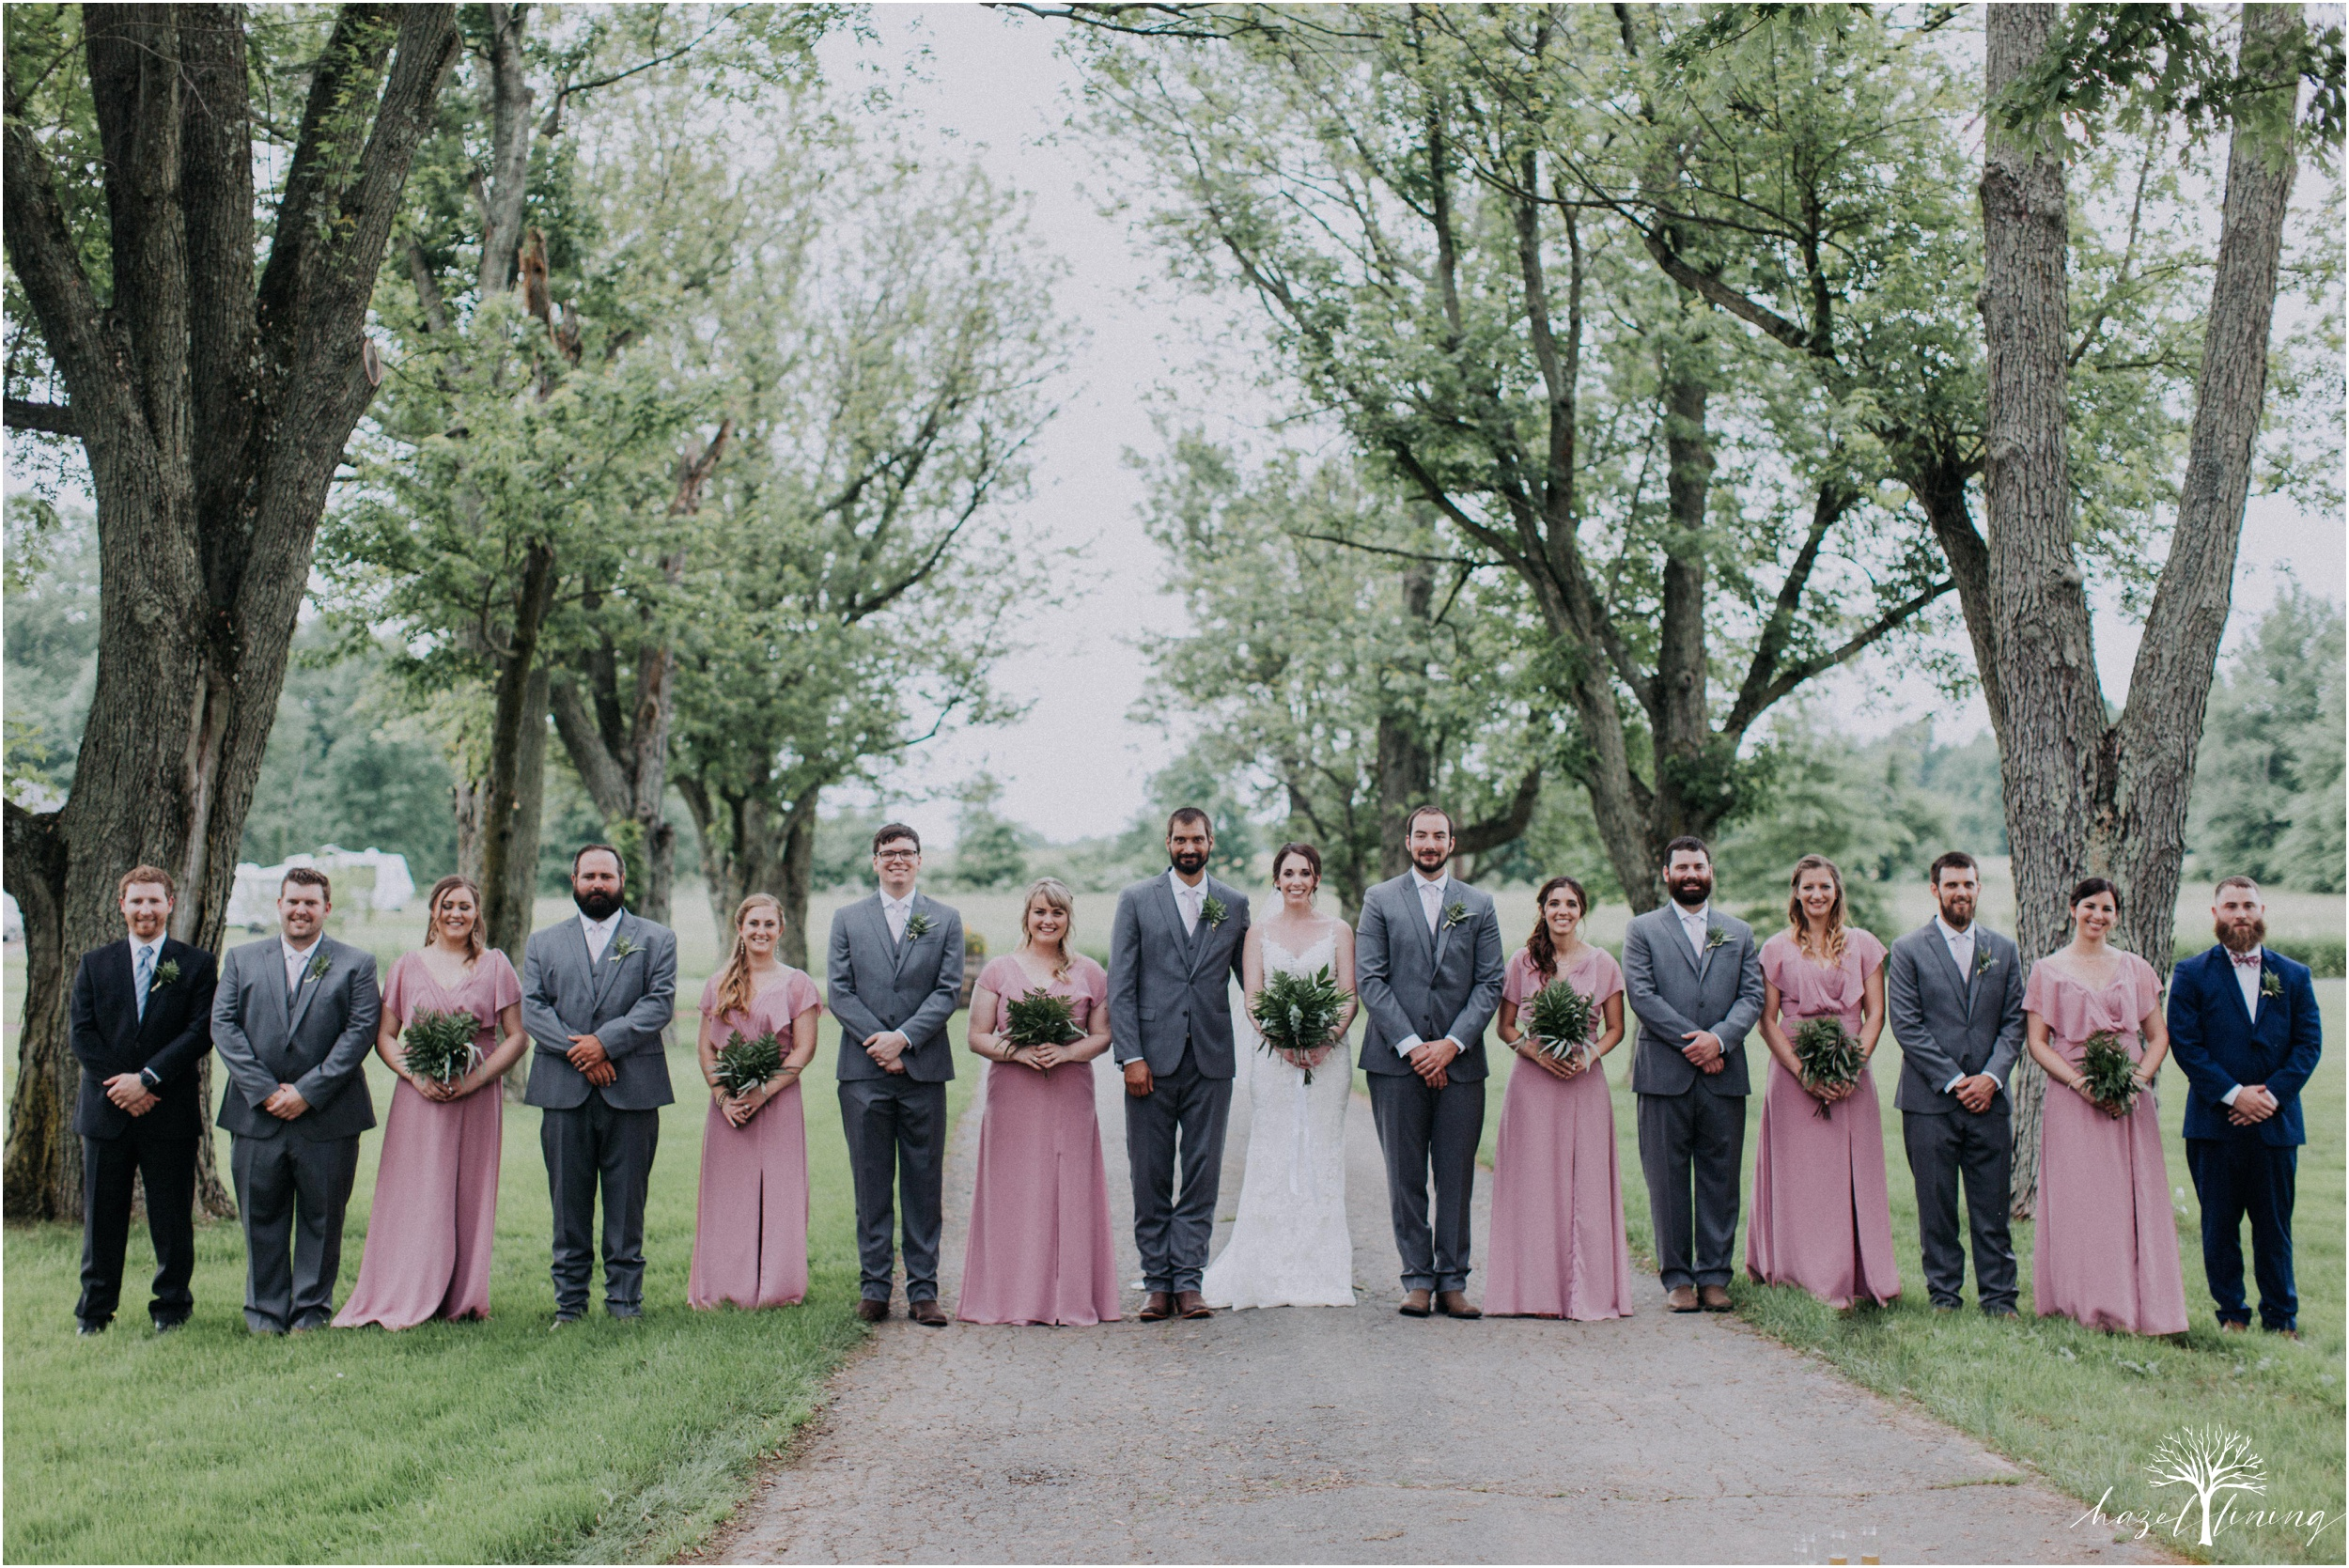 hazel-lining-travel-wedding-elopement-photography-lisa-landon-shoemaker-the-farm-bakery-and-events-bucks-county-quakertown-pennsylvania-summer-country-outdoor-farm-wedding_0079.jpg